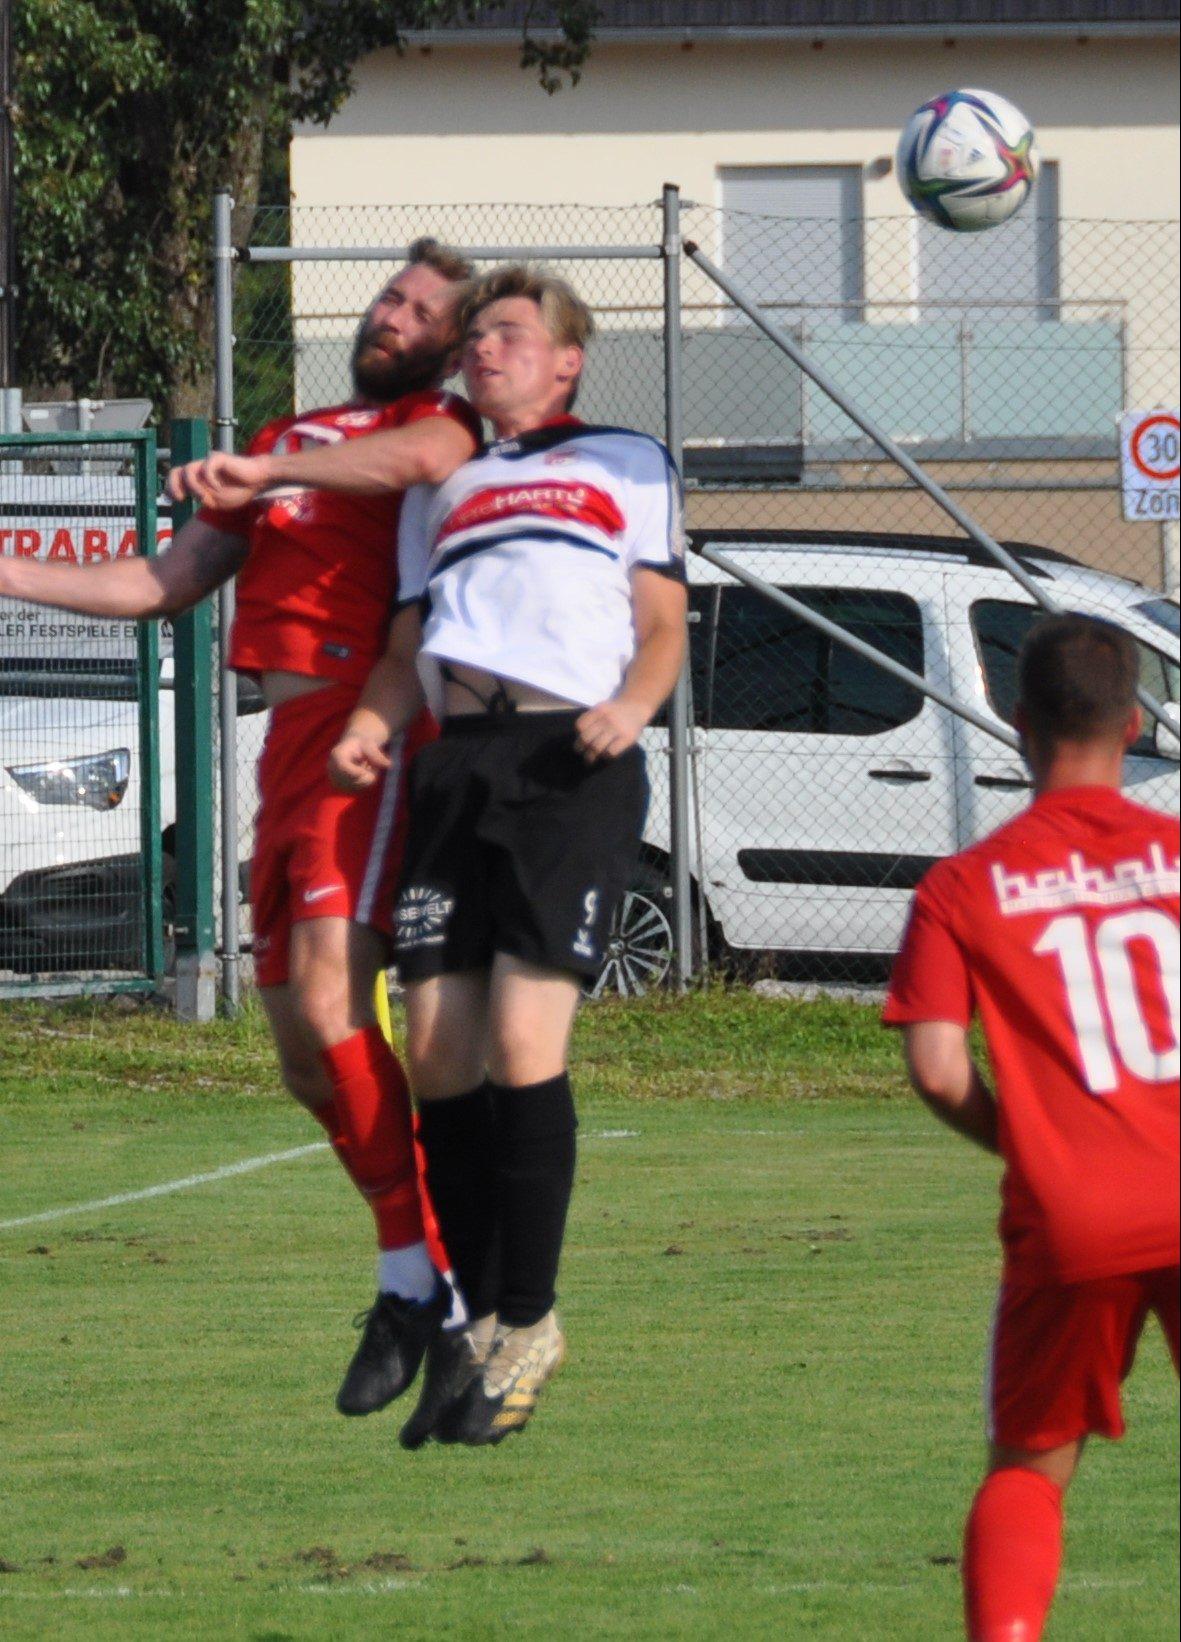 Union Katsdorf vs. Union TTI St. Florian Cup 2021